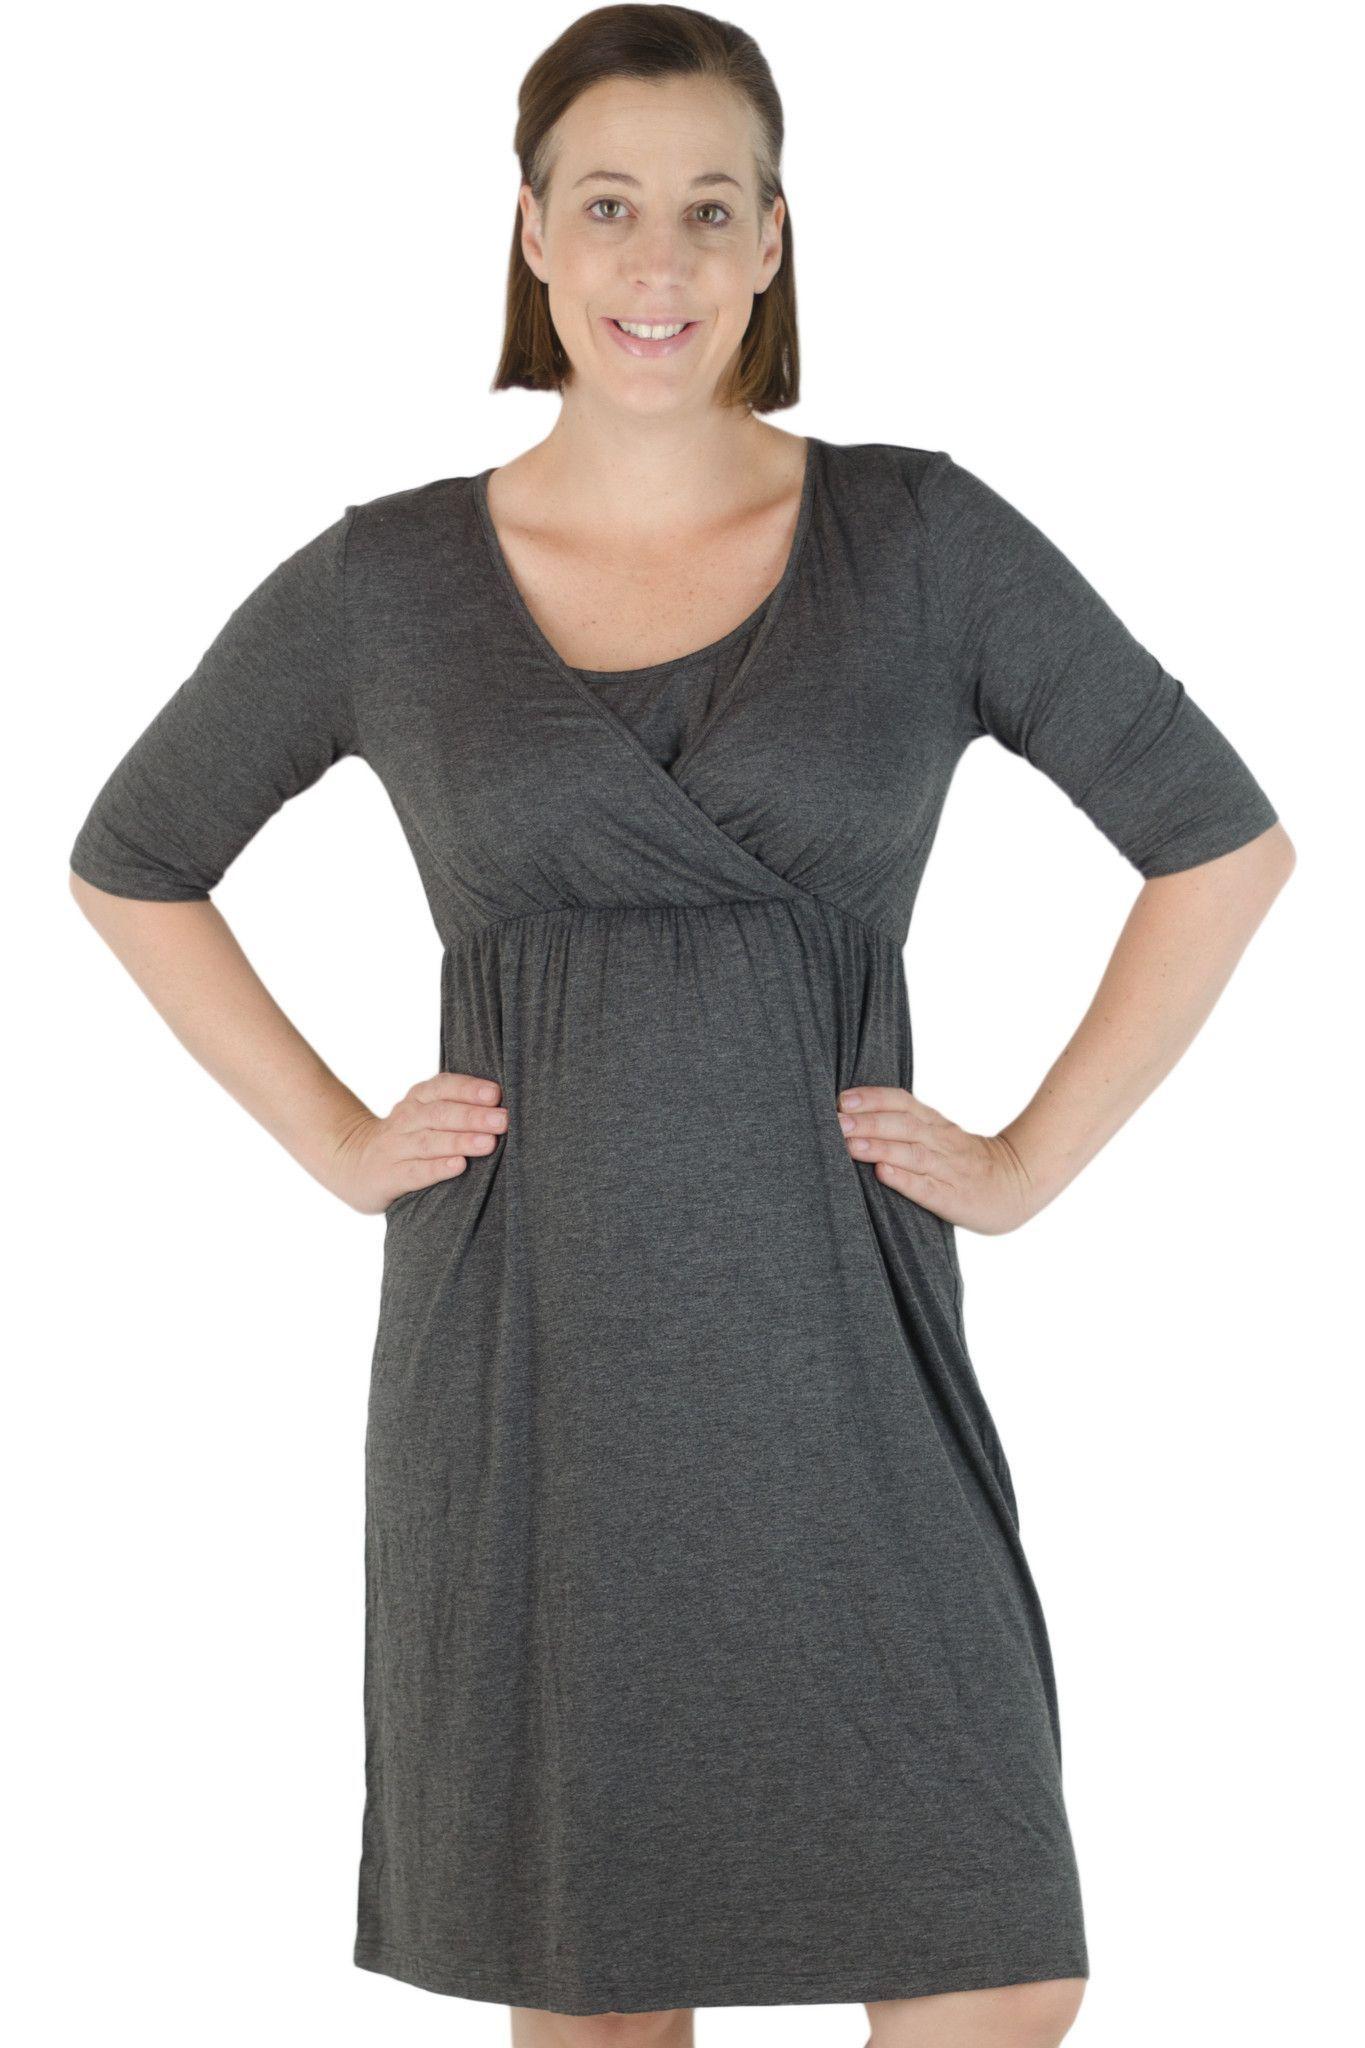 Latched Mama 3/4 Sleeve V-neck Nursing Dress